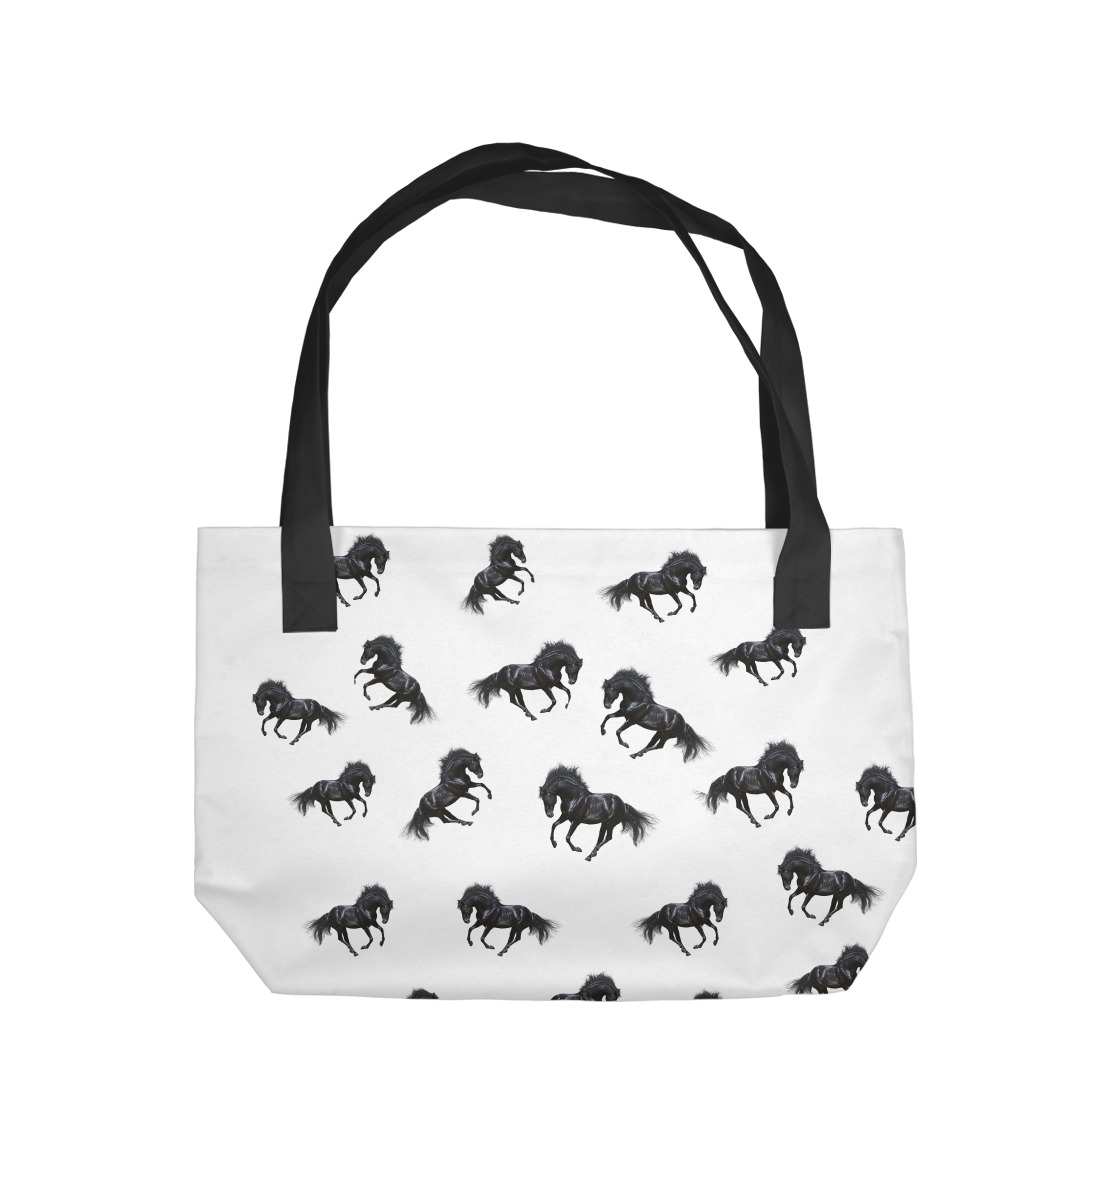 Пляжная сумка Кони (556256)